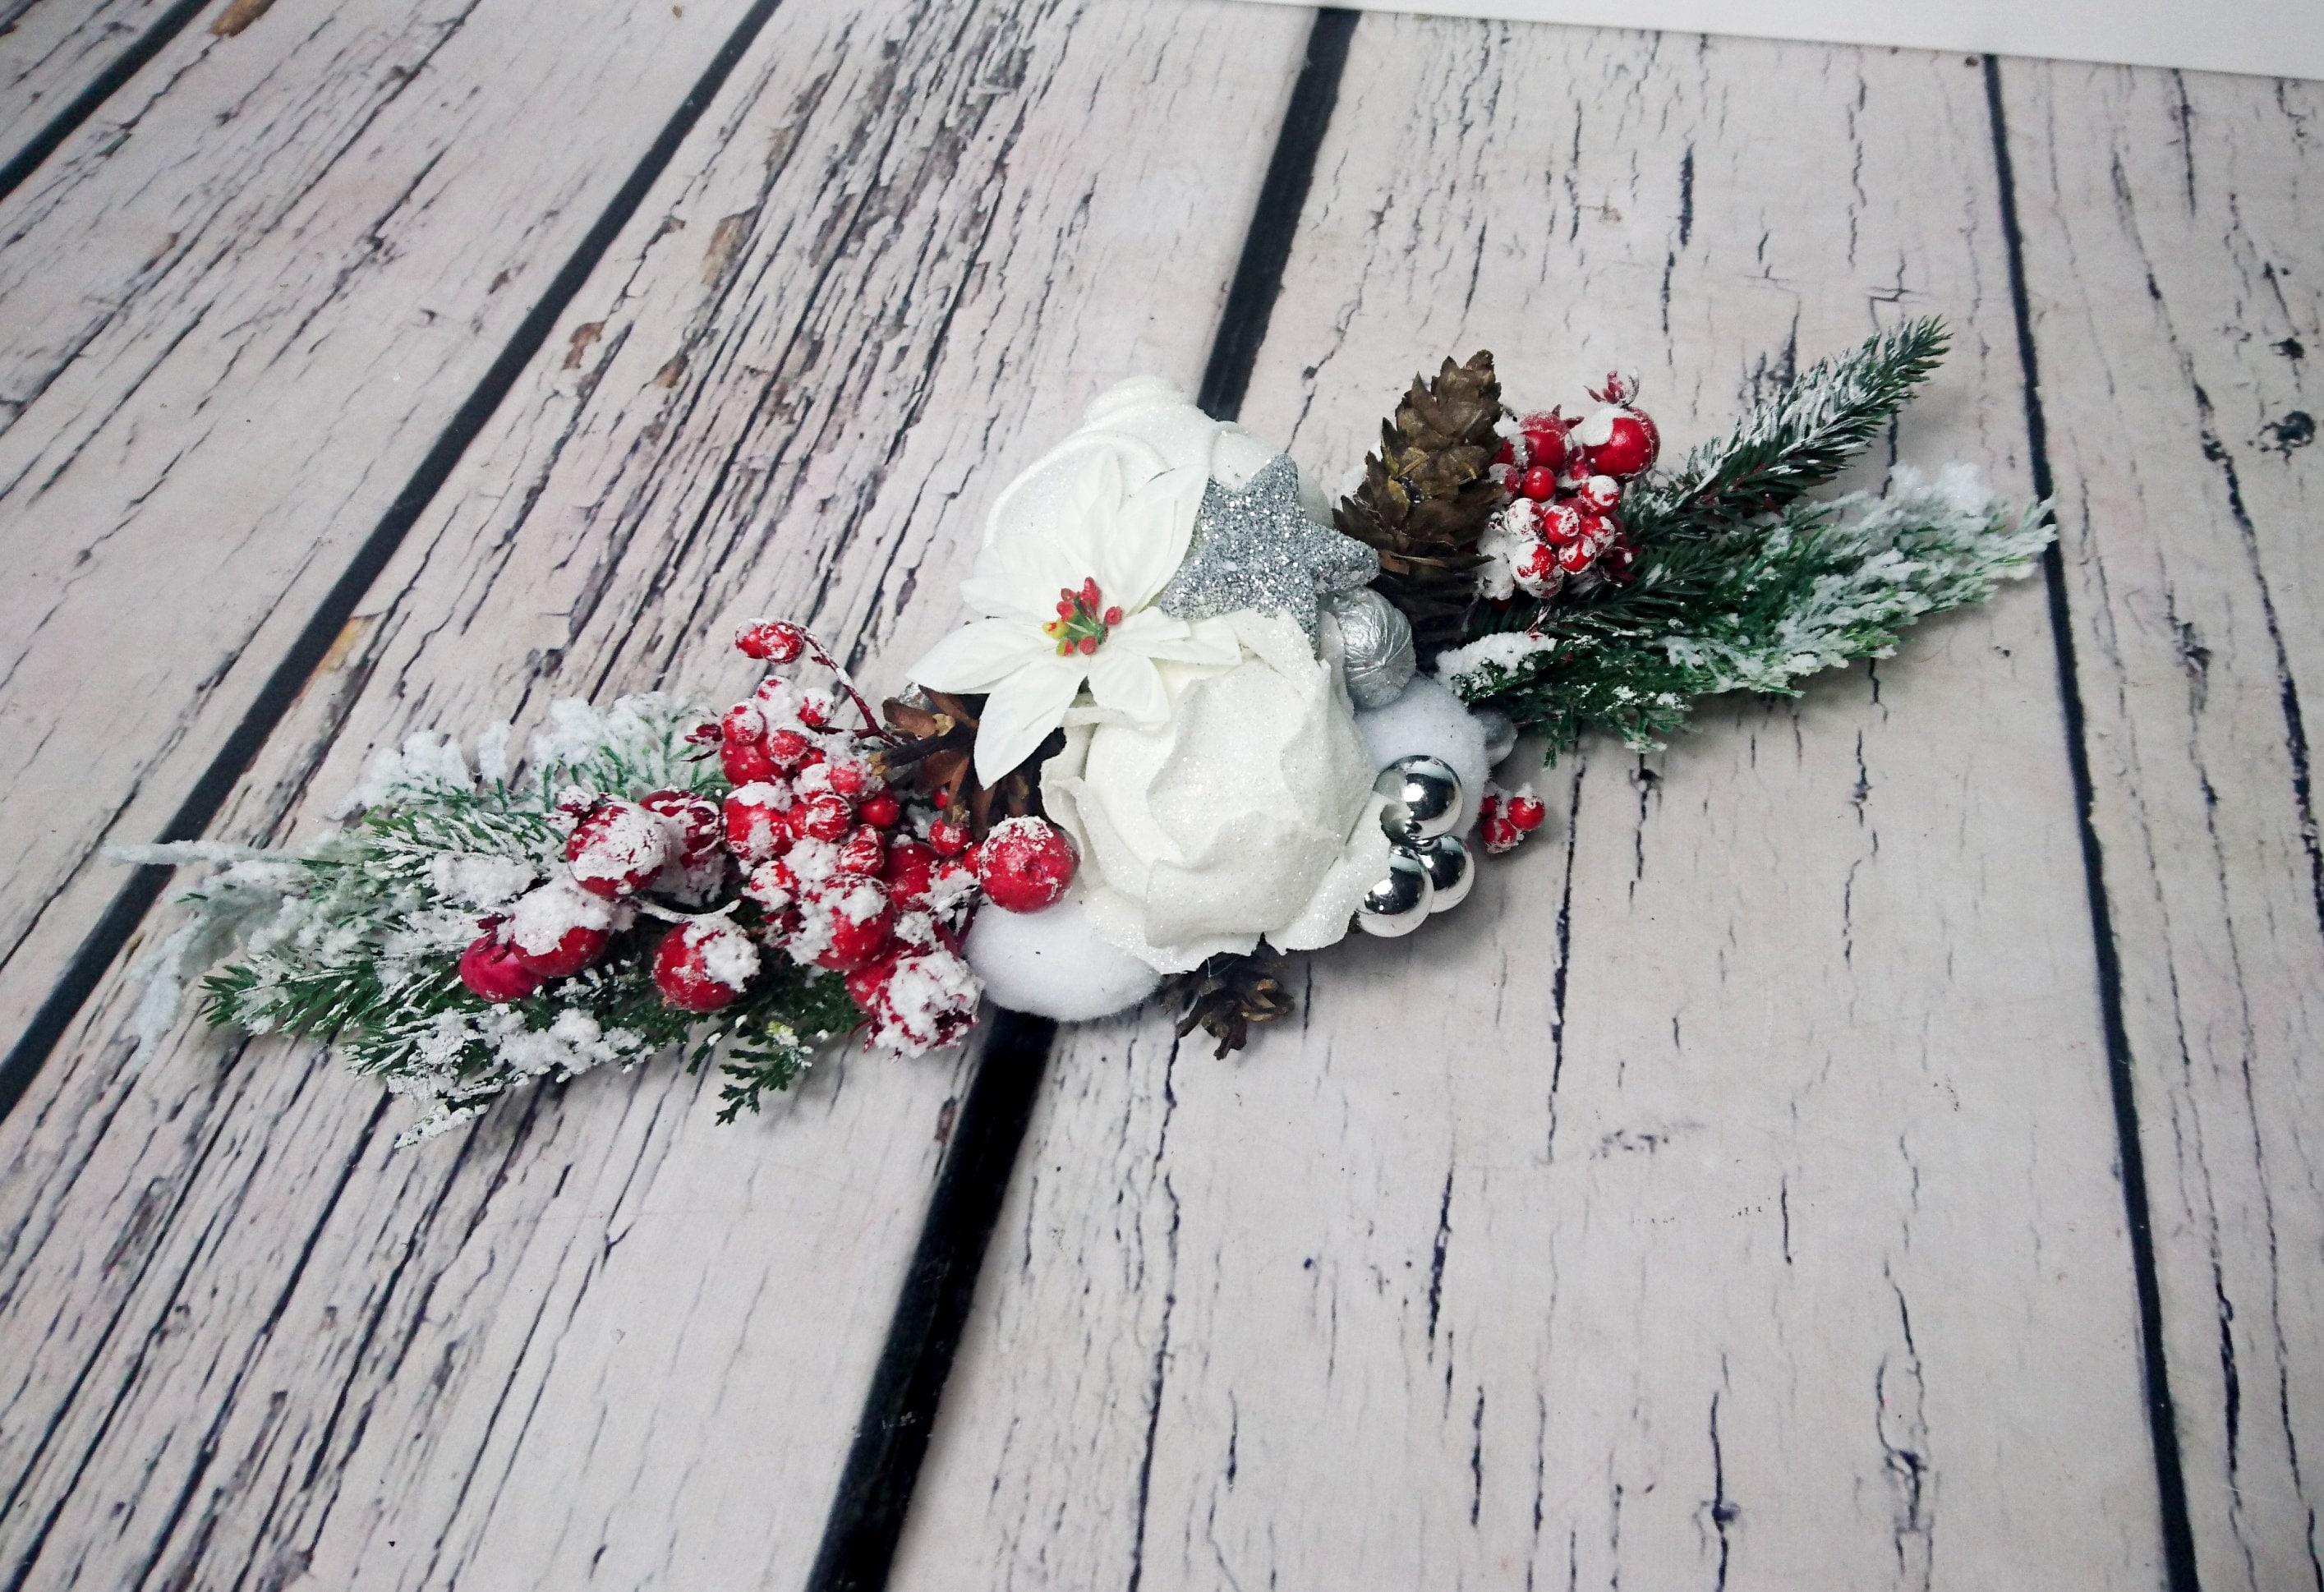 Snowy fir Christmas wedding centerpiece table decor, red berries ...